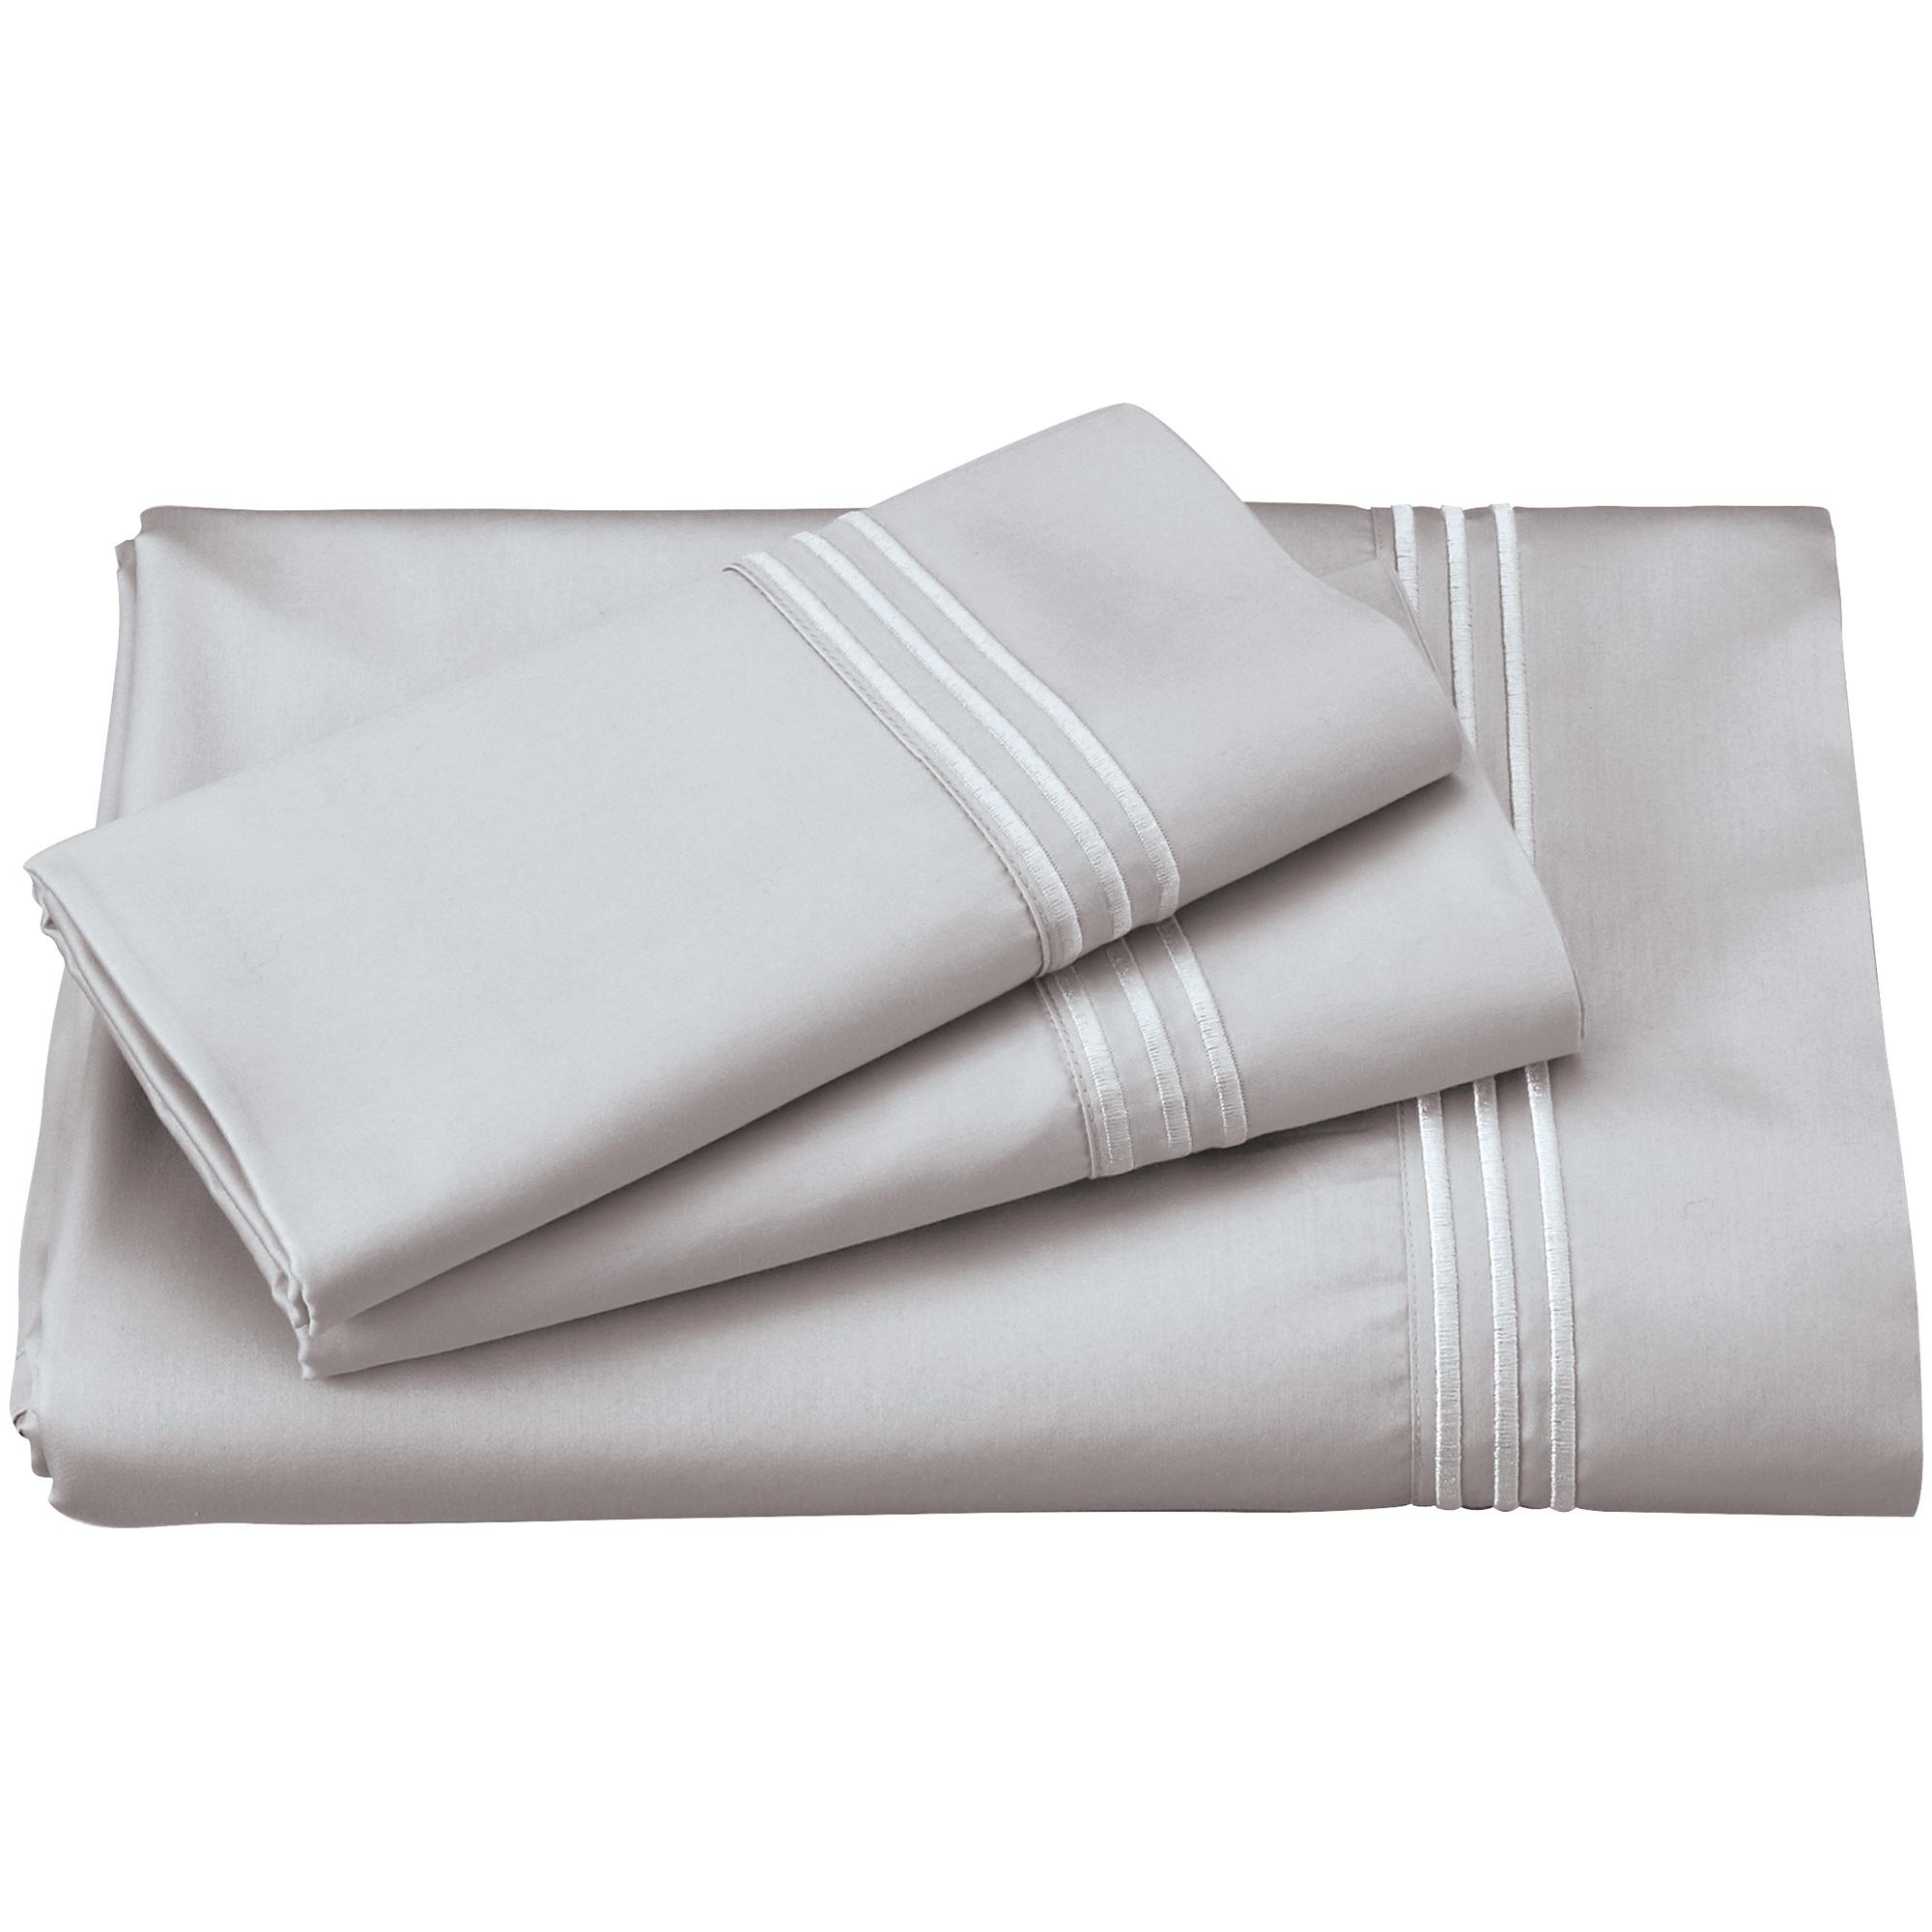 Purecare | Elements Dove Gray King Celliant Pillowcase